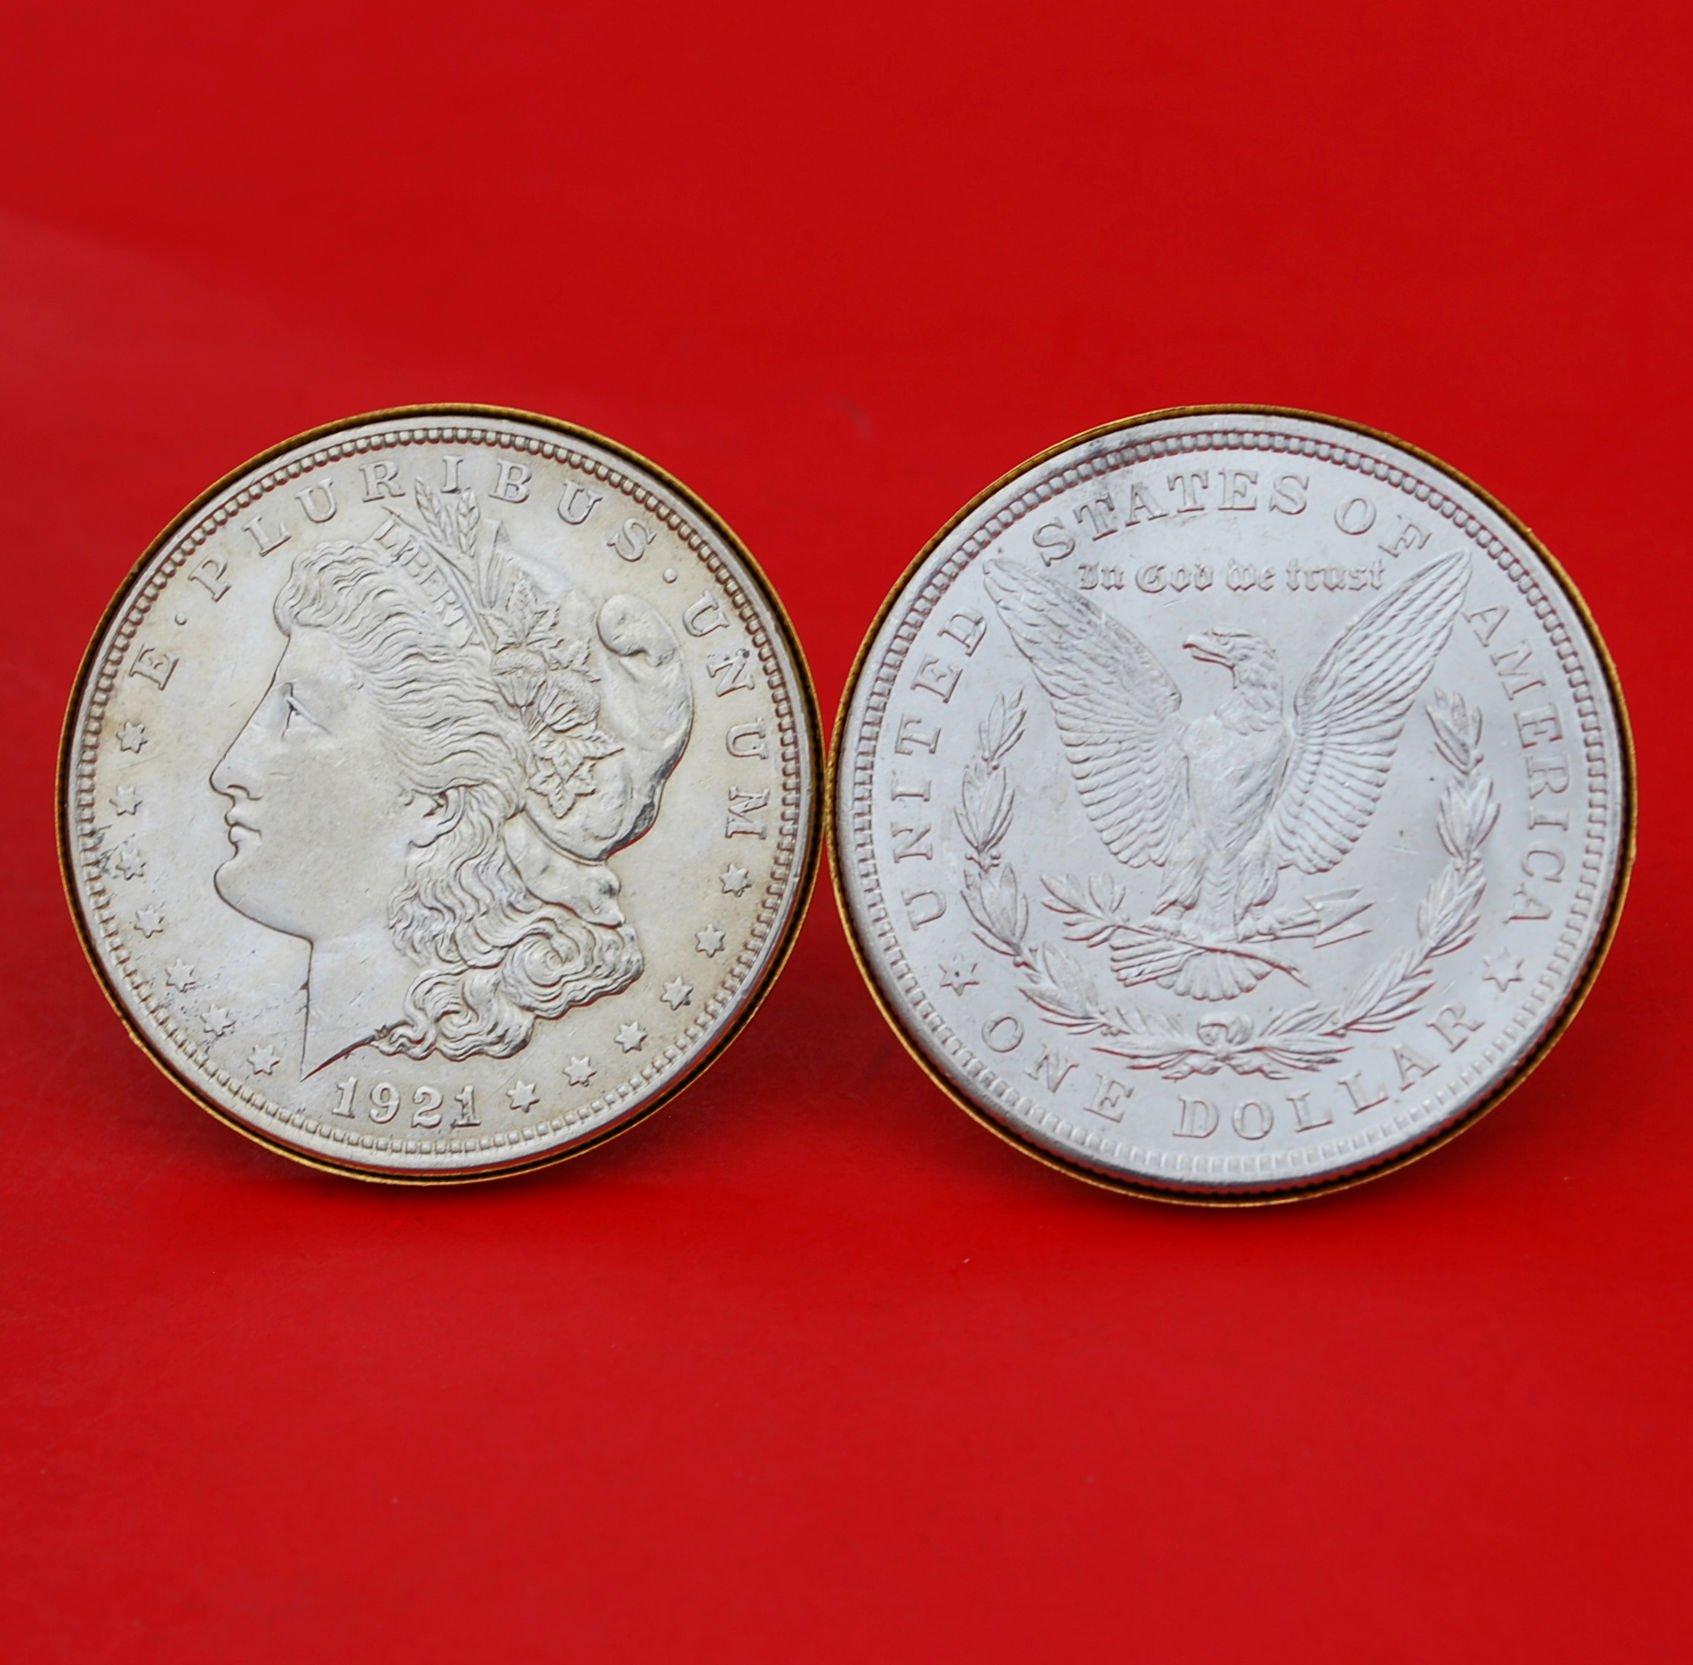 US 1921 Morgan Silver Dollar BU Uncirculated Gold Cufflinks NEW - OBVERSE + REVERSE